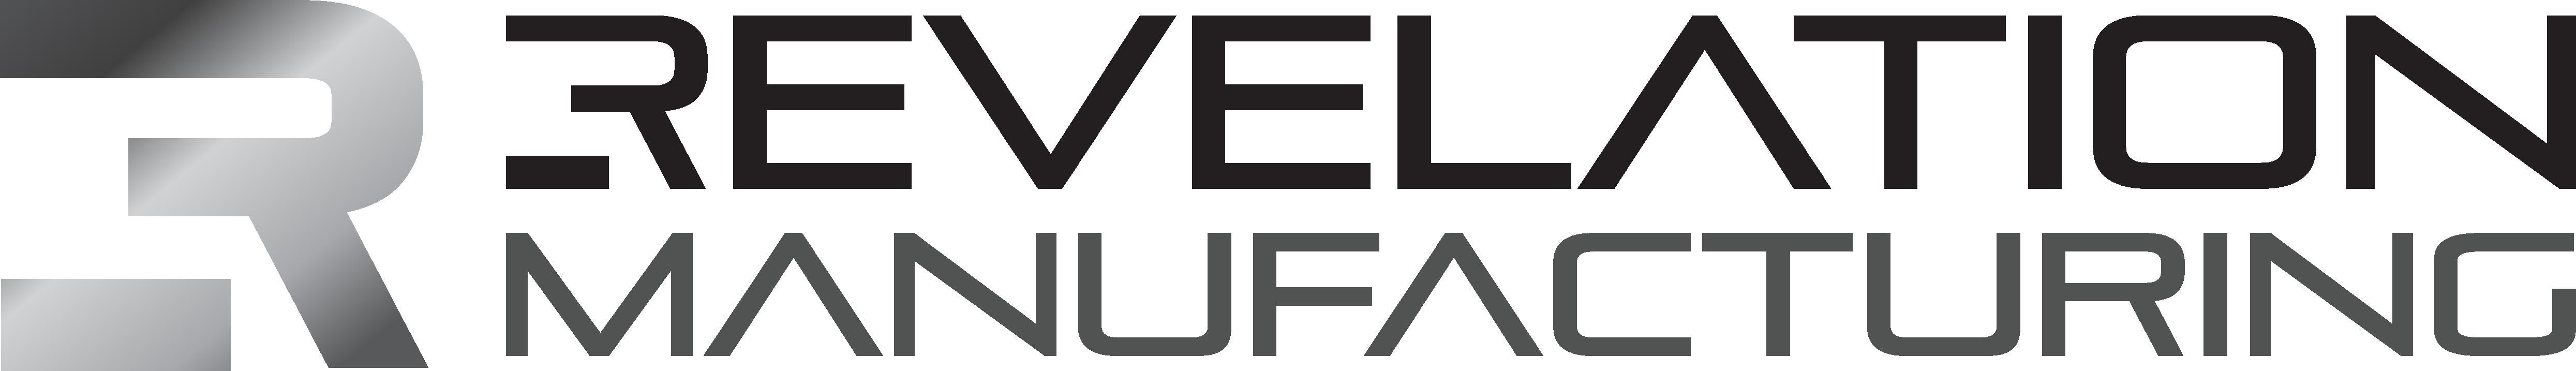 Revelation Manufacturing Logo